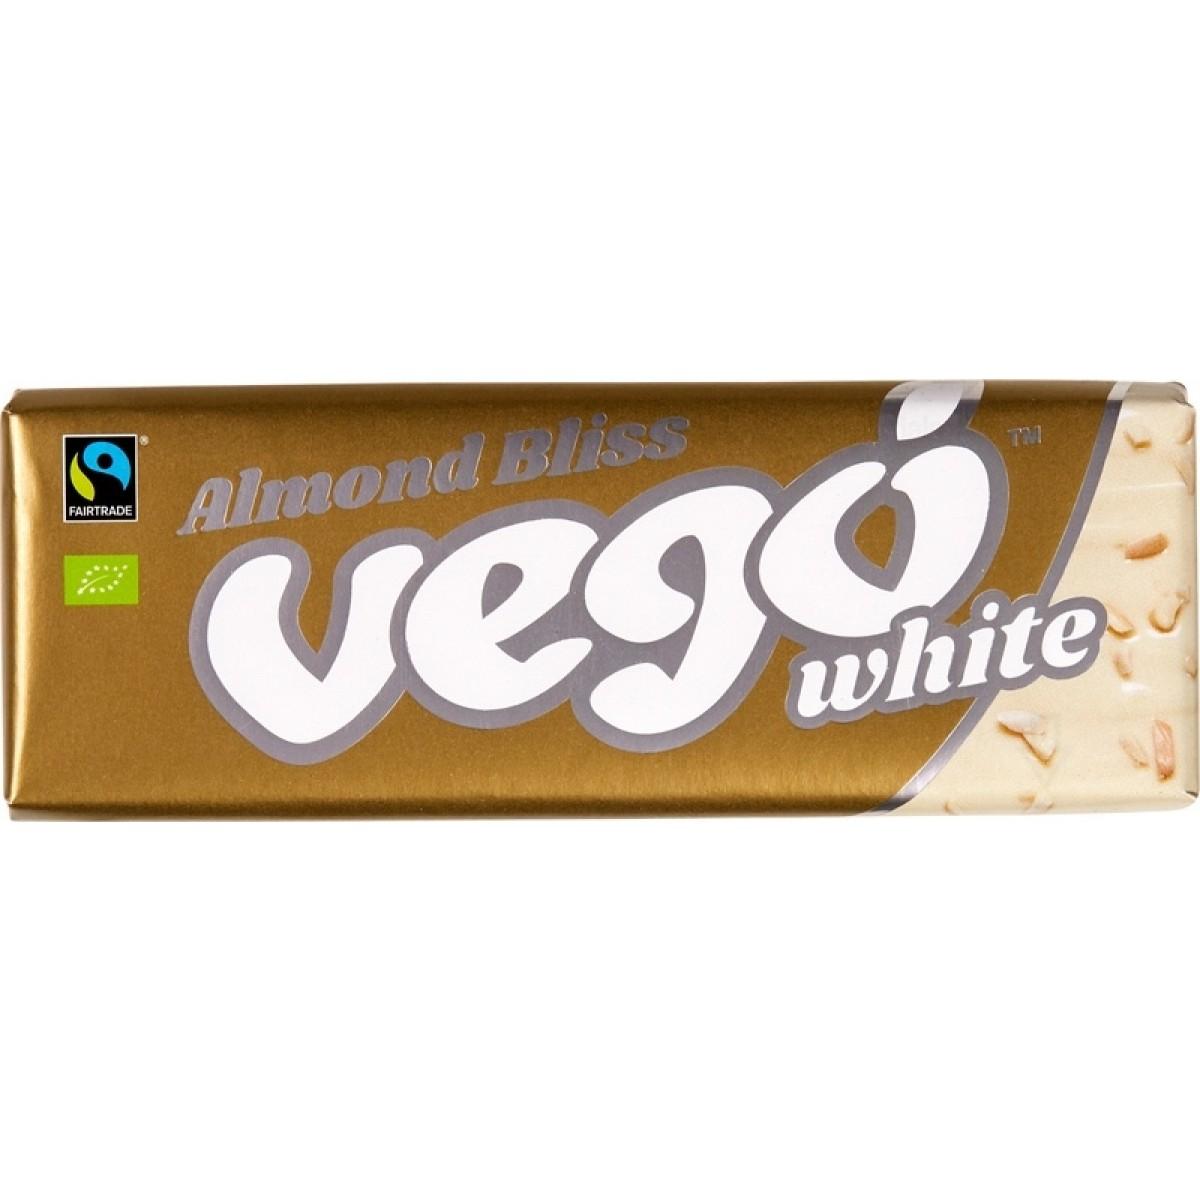 Chocoladereep Wit & Amandel